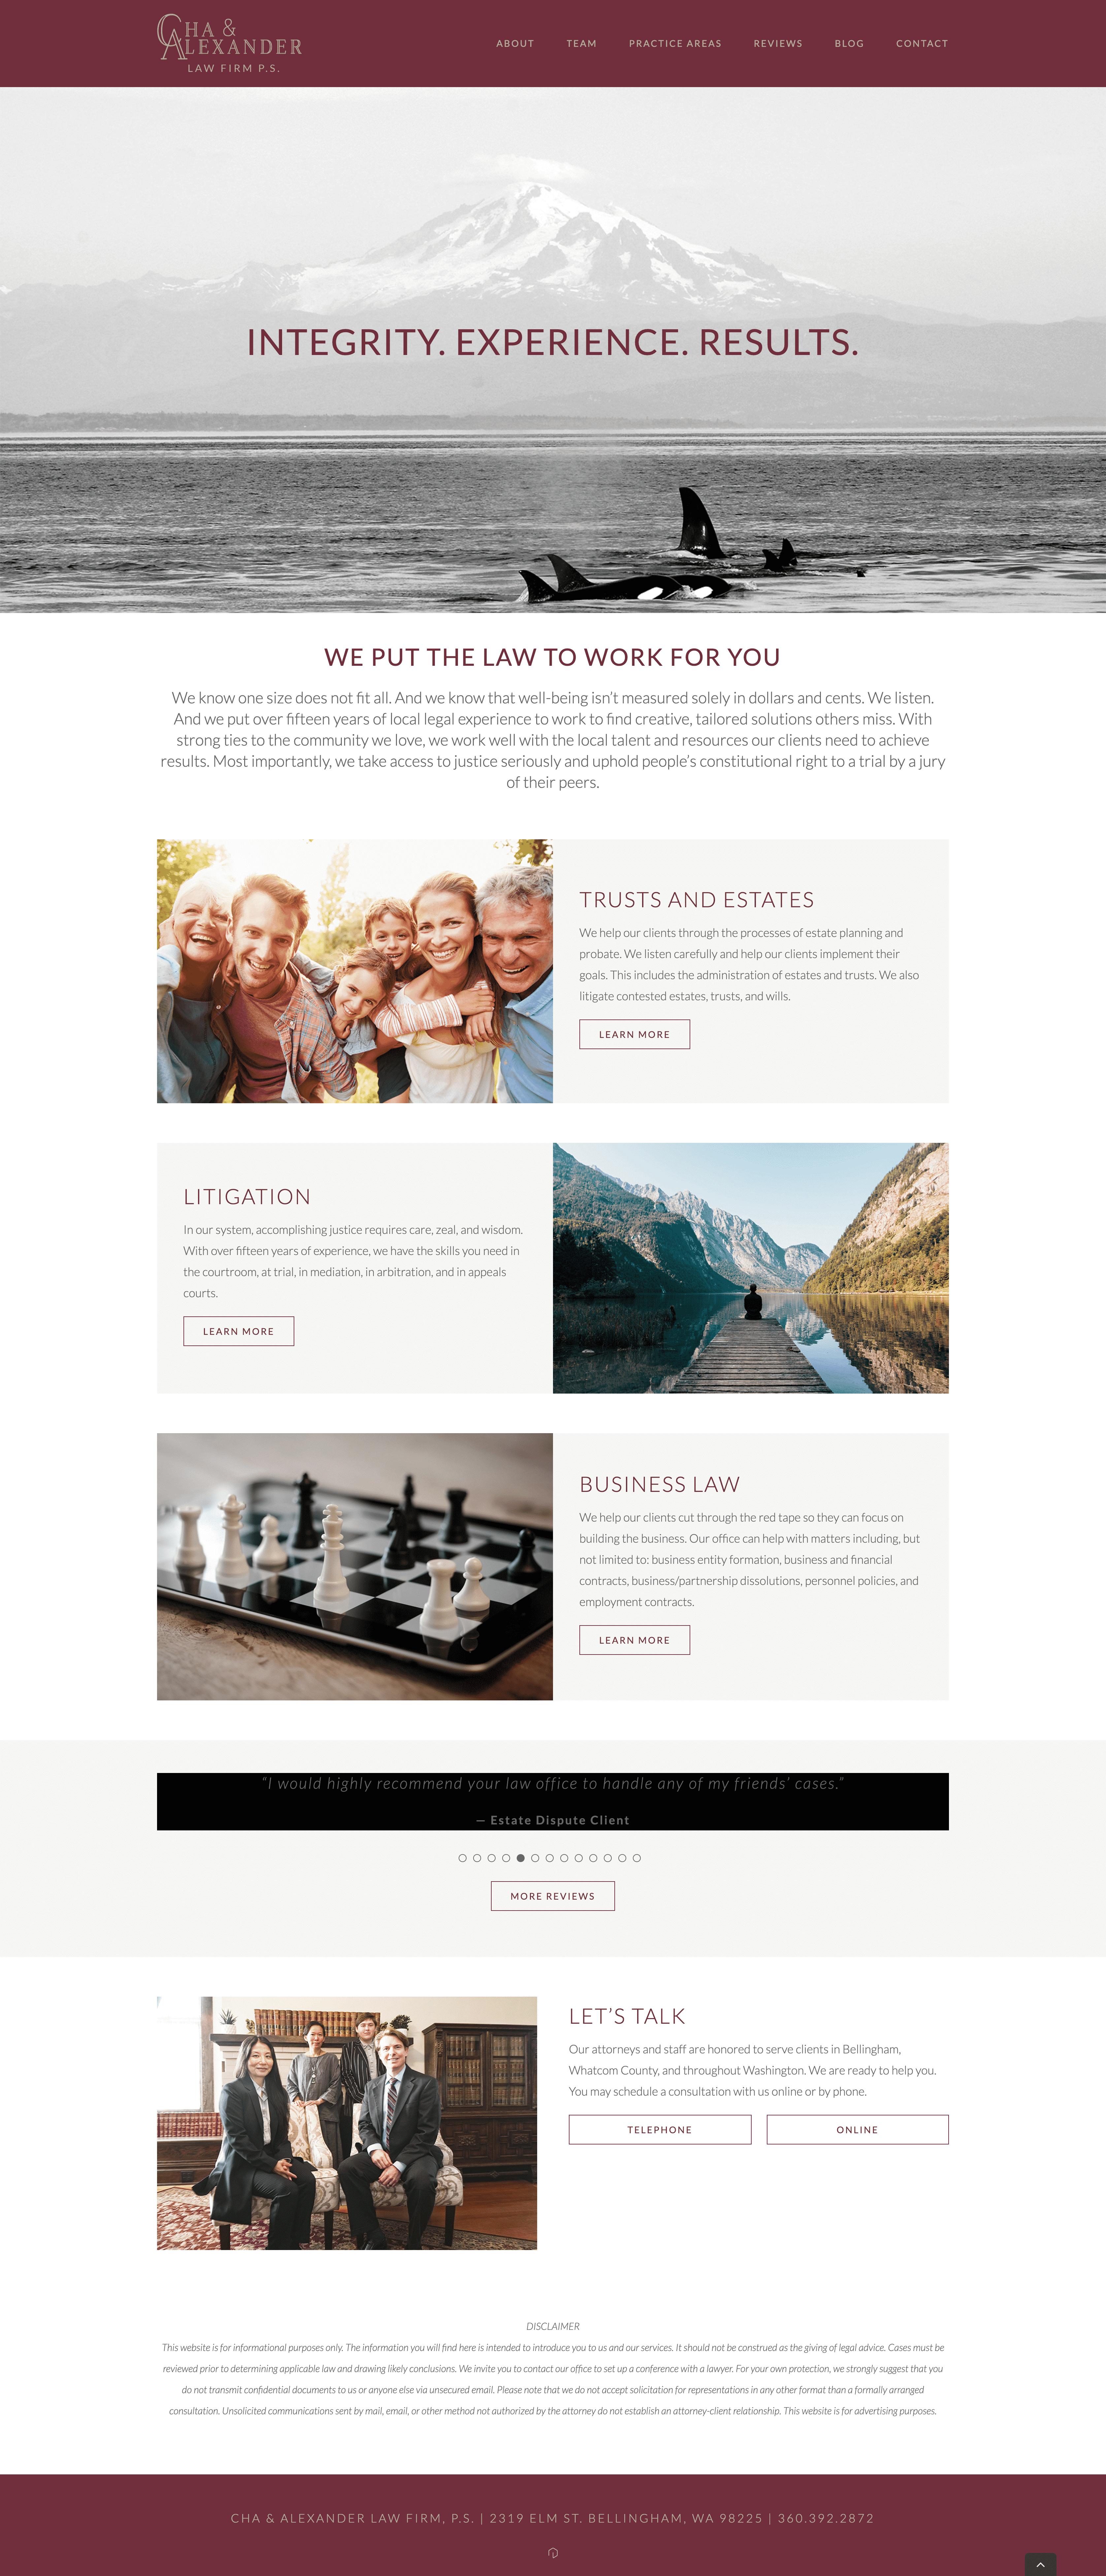 Cha & Alexander Home Page Design